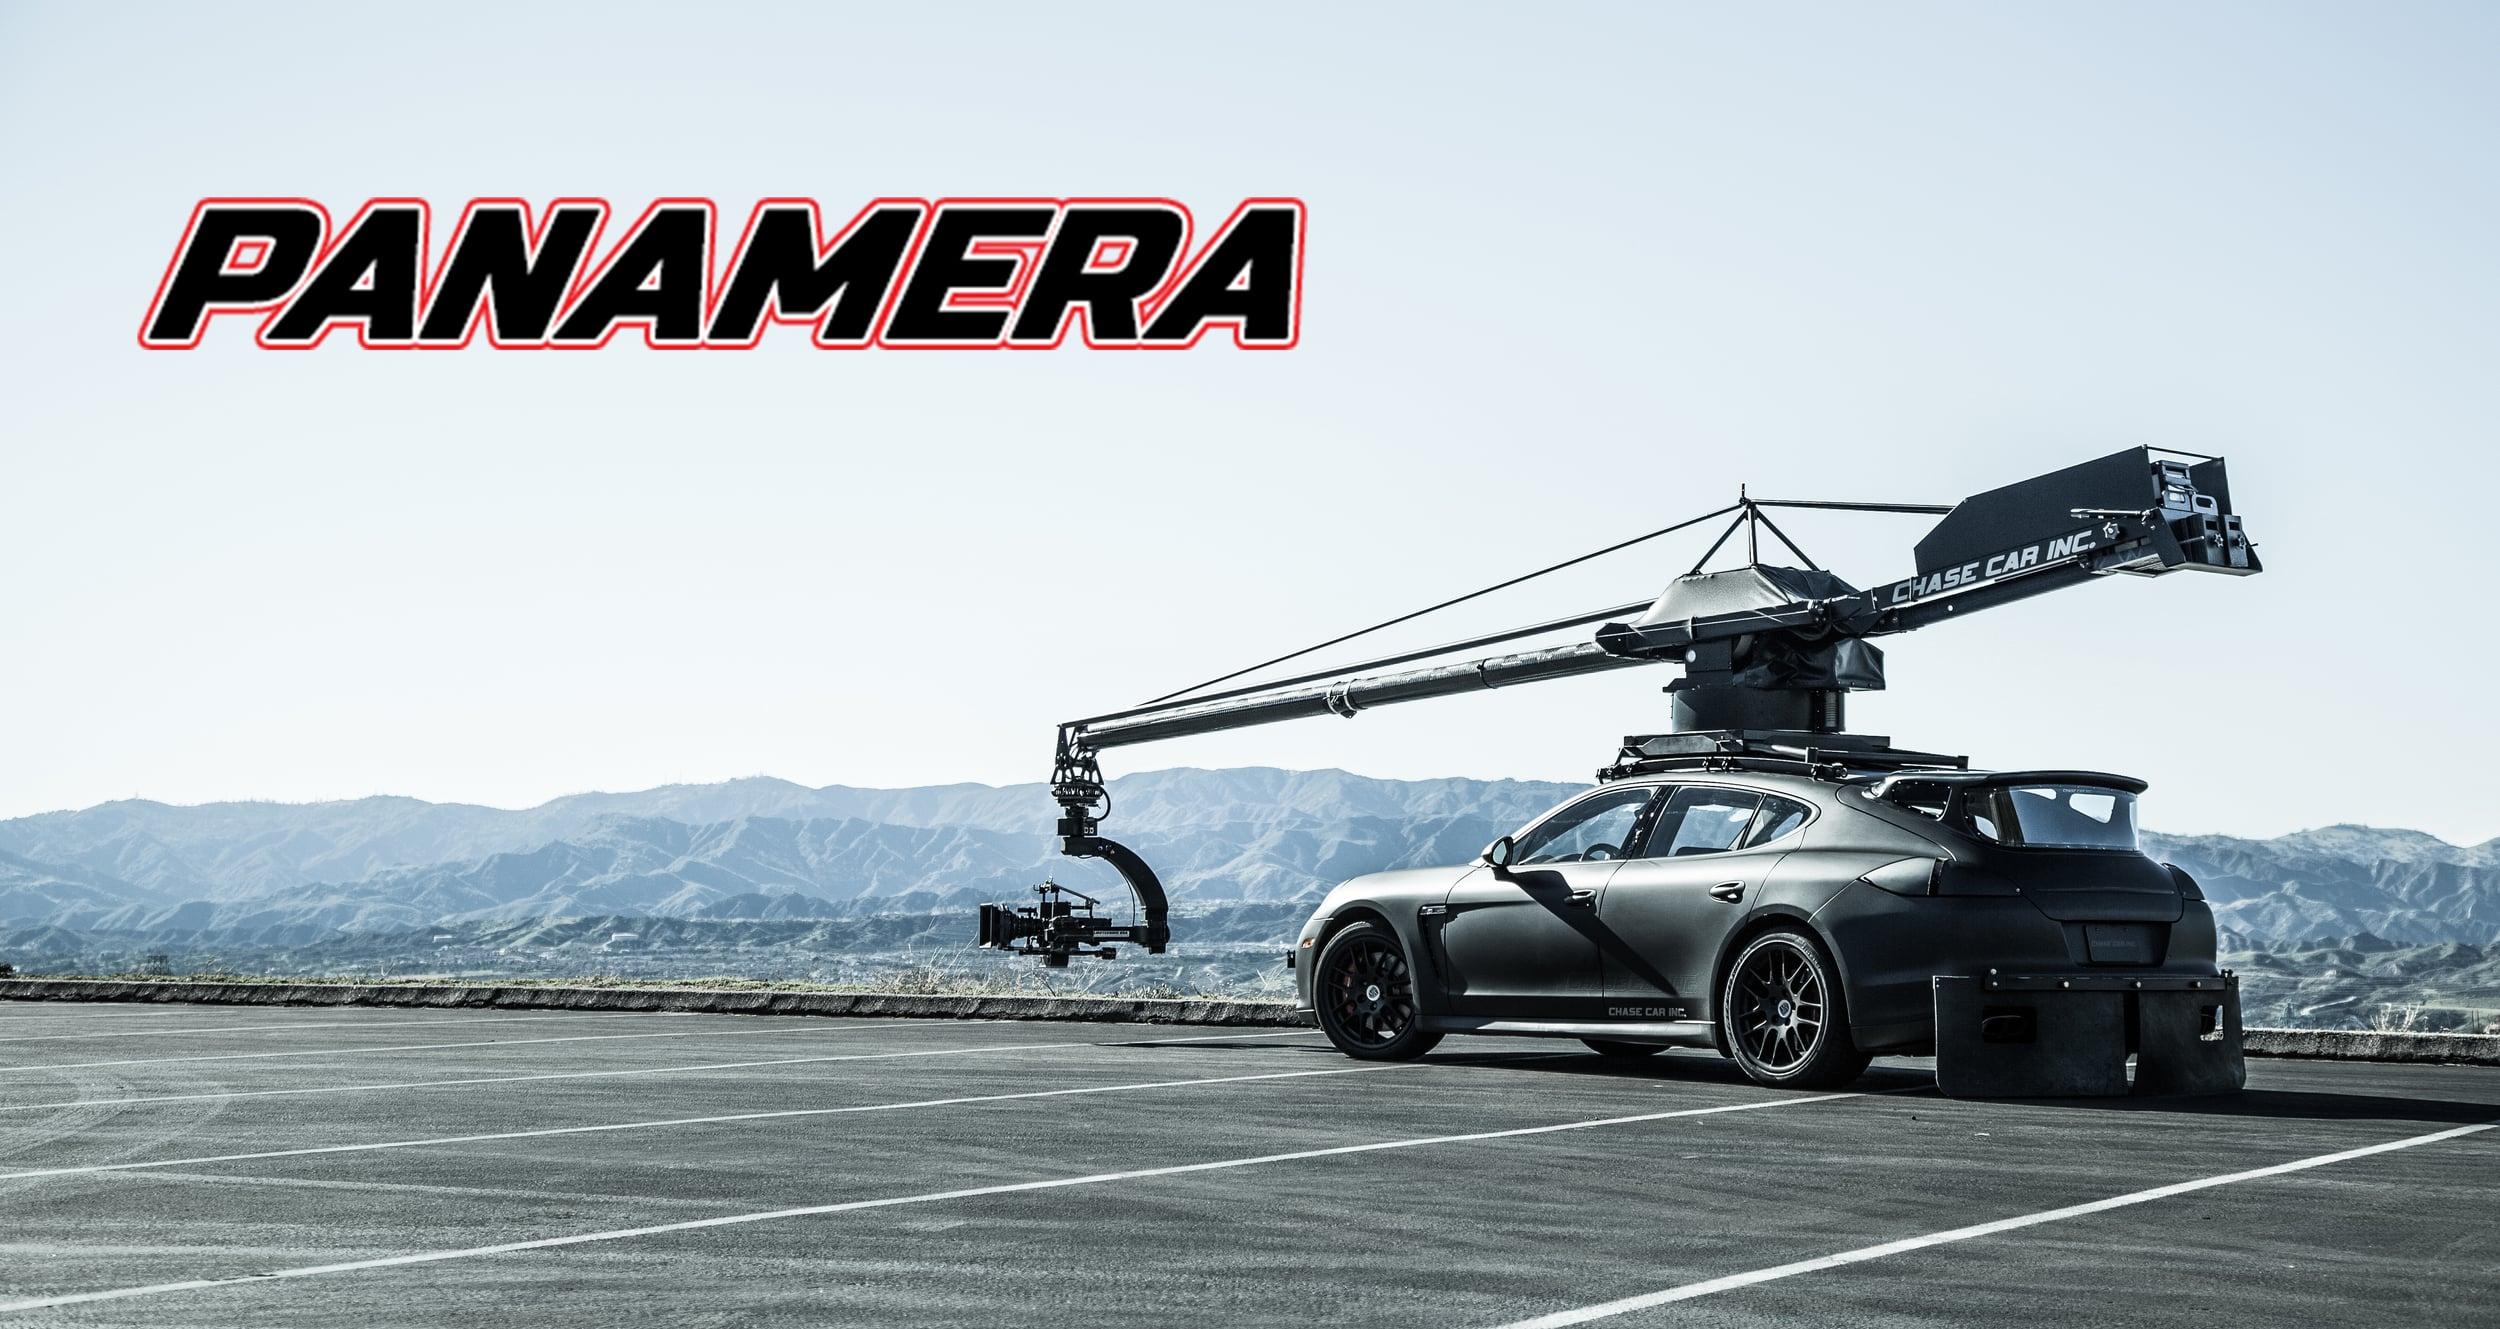 porsche-panamera-camera-car